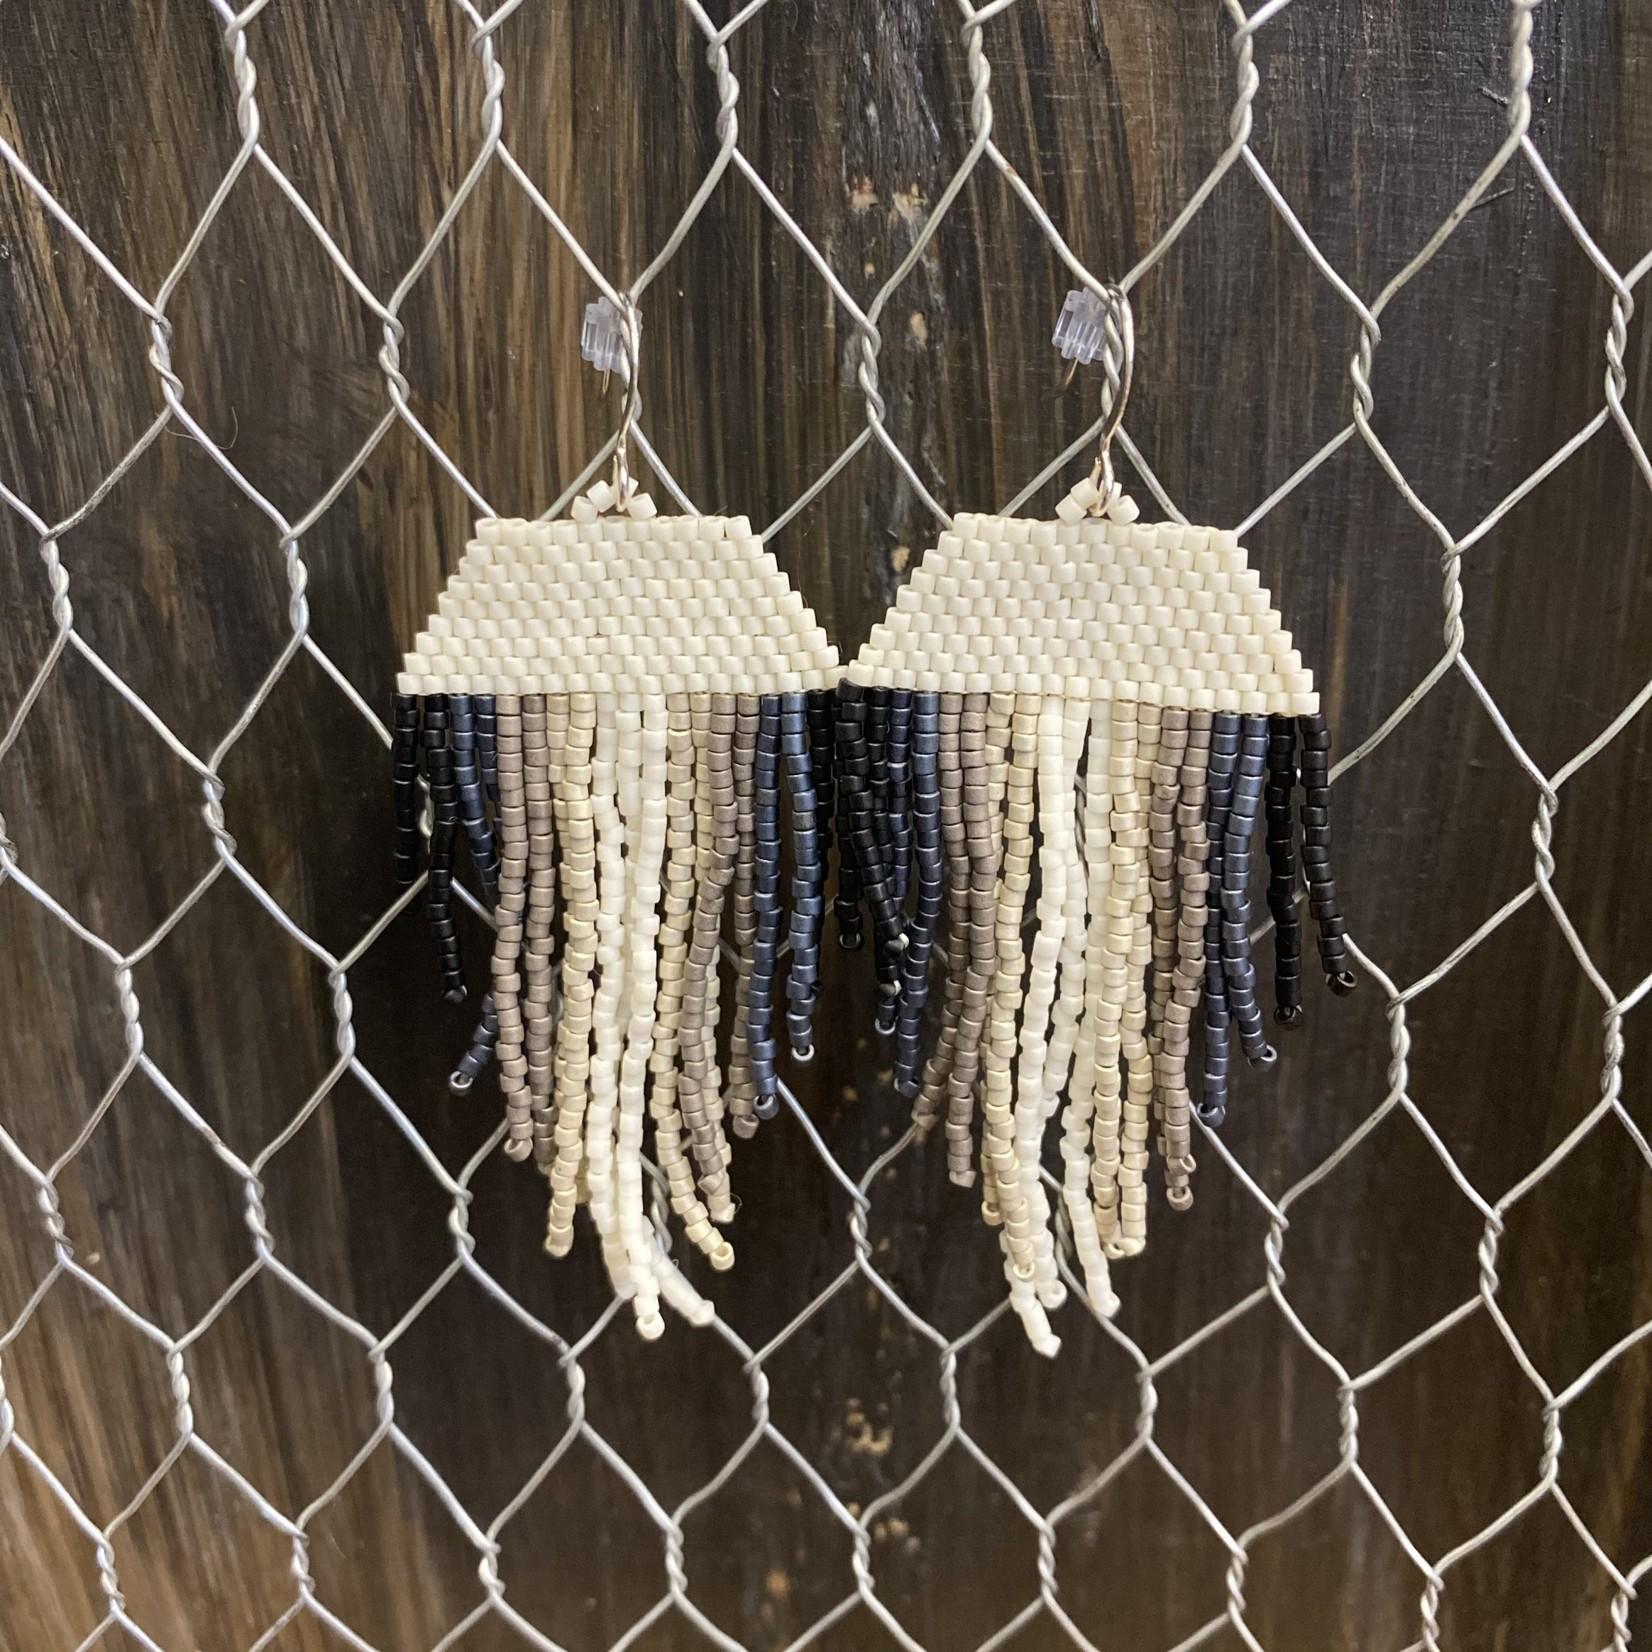 Hillary Linzy Little Grave Creek Fringe Earrings - Ivory/black/gray